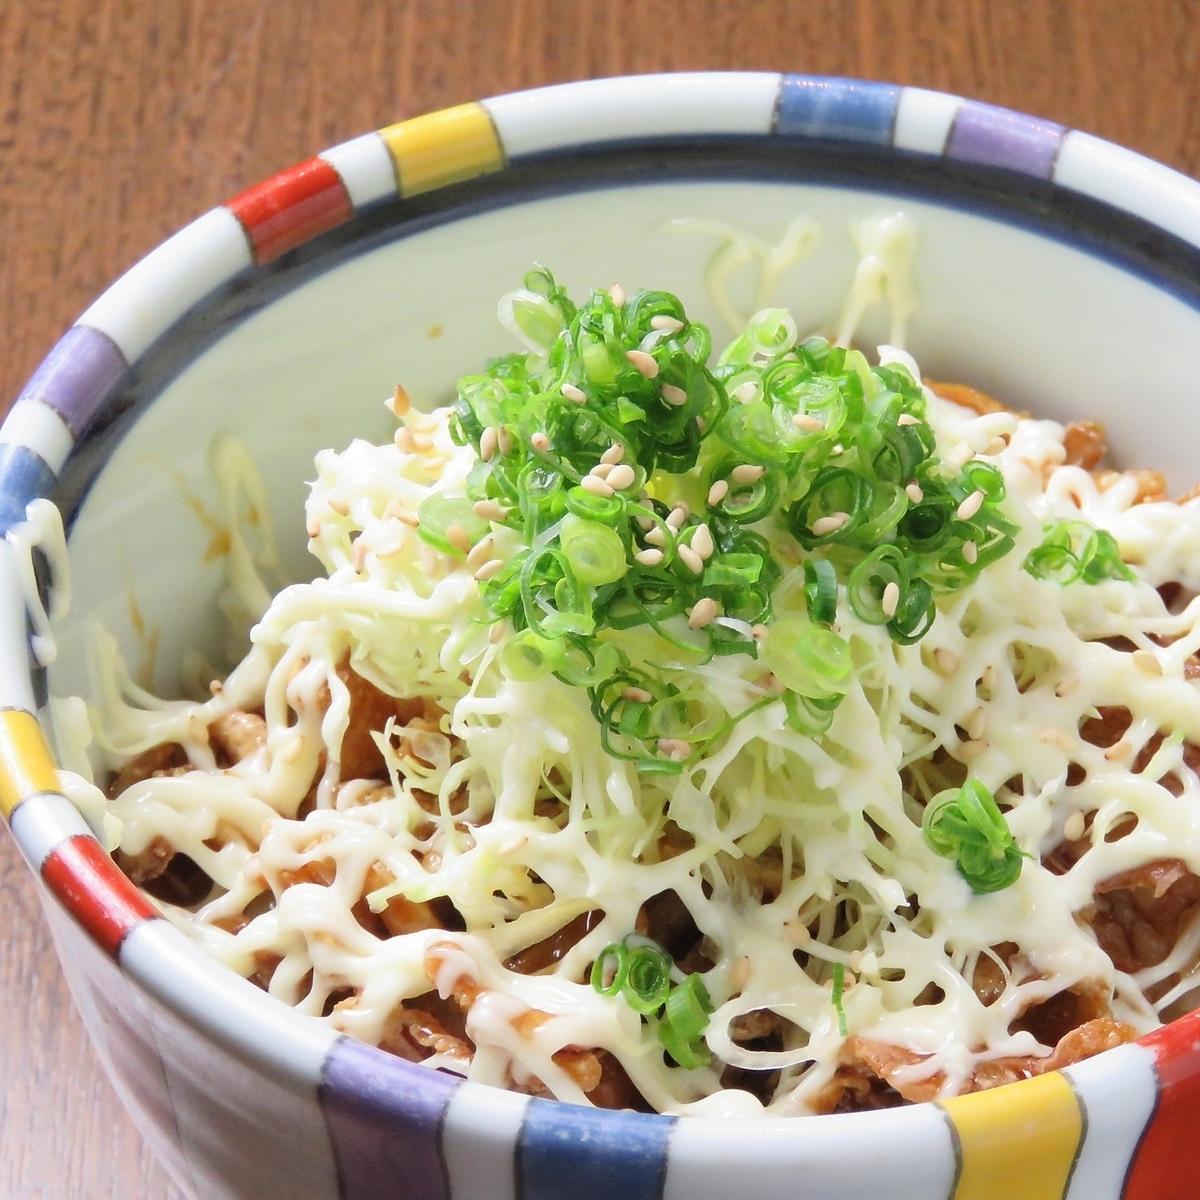 Tatorusho on rice